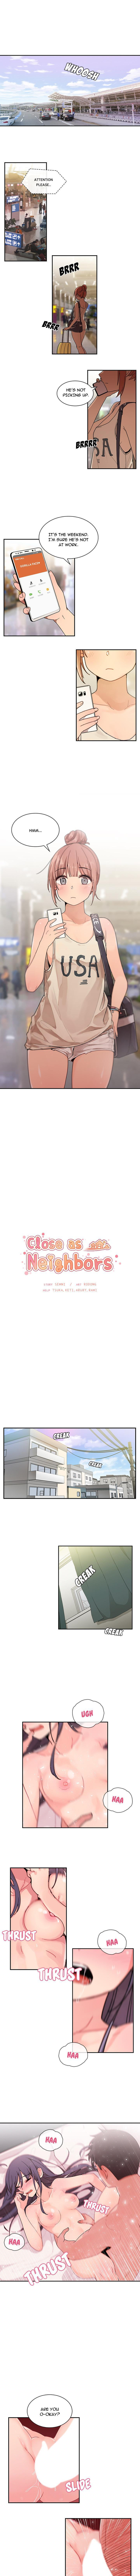 Close as Neighbors 62